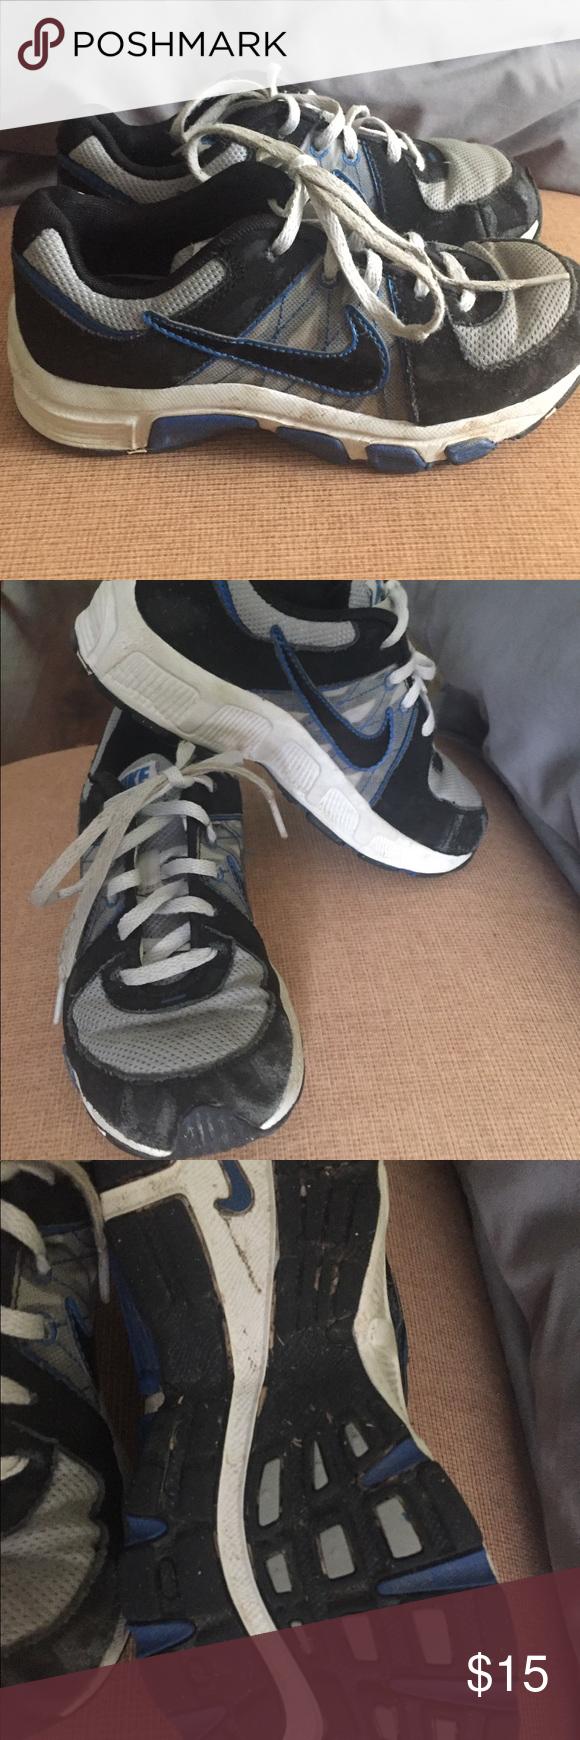 boys size 1 tennis shoes